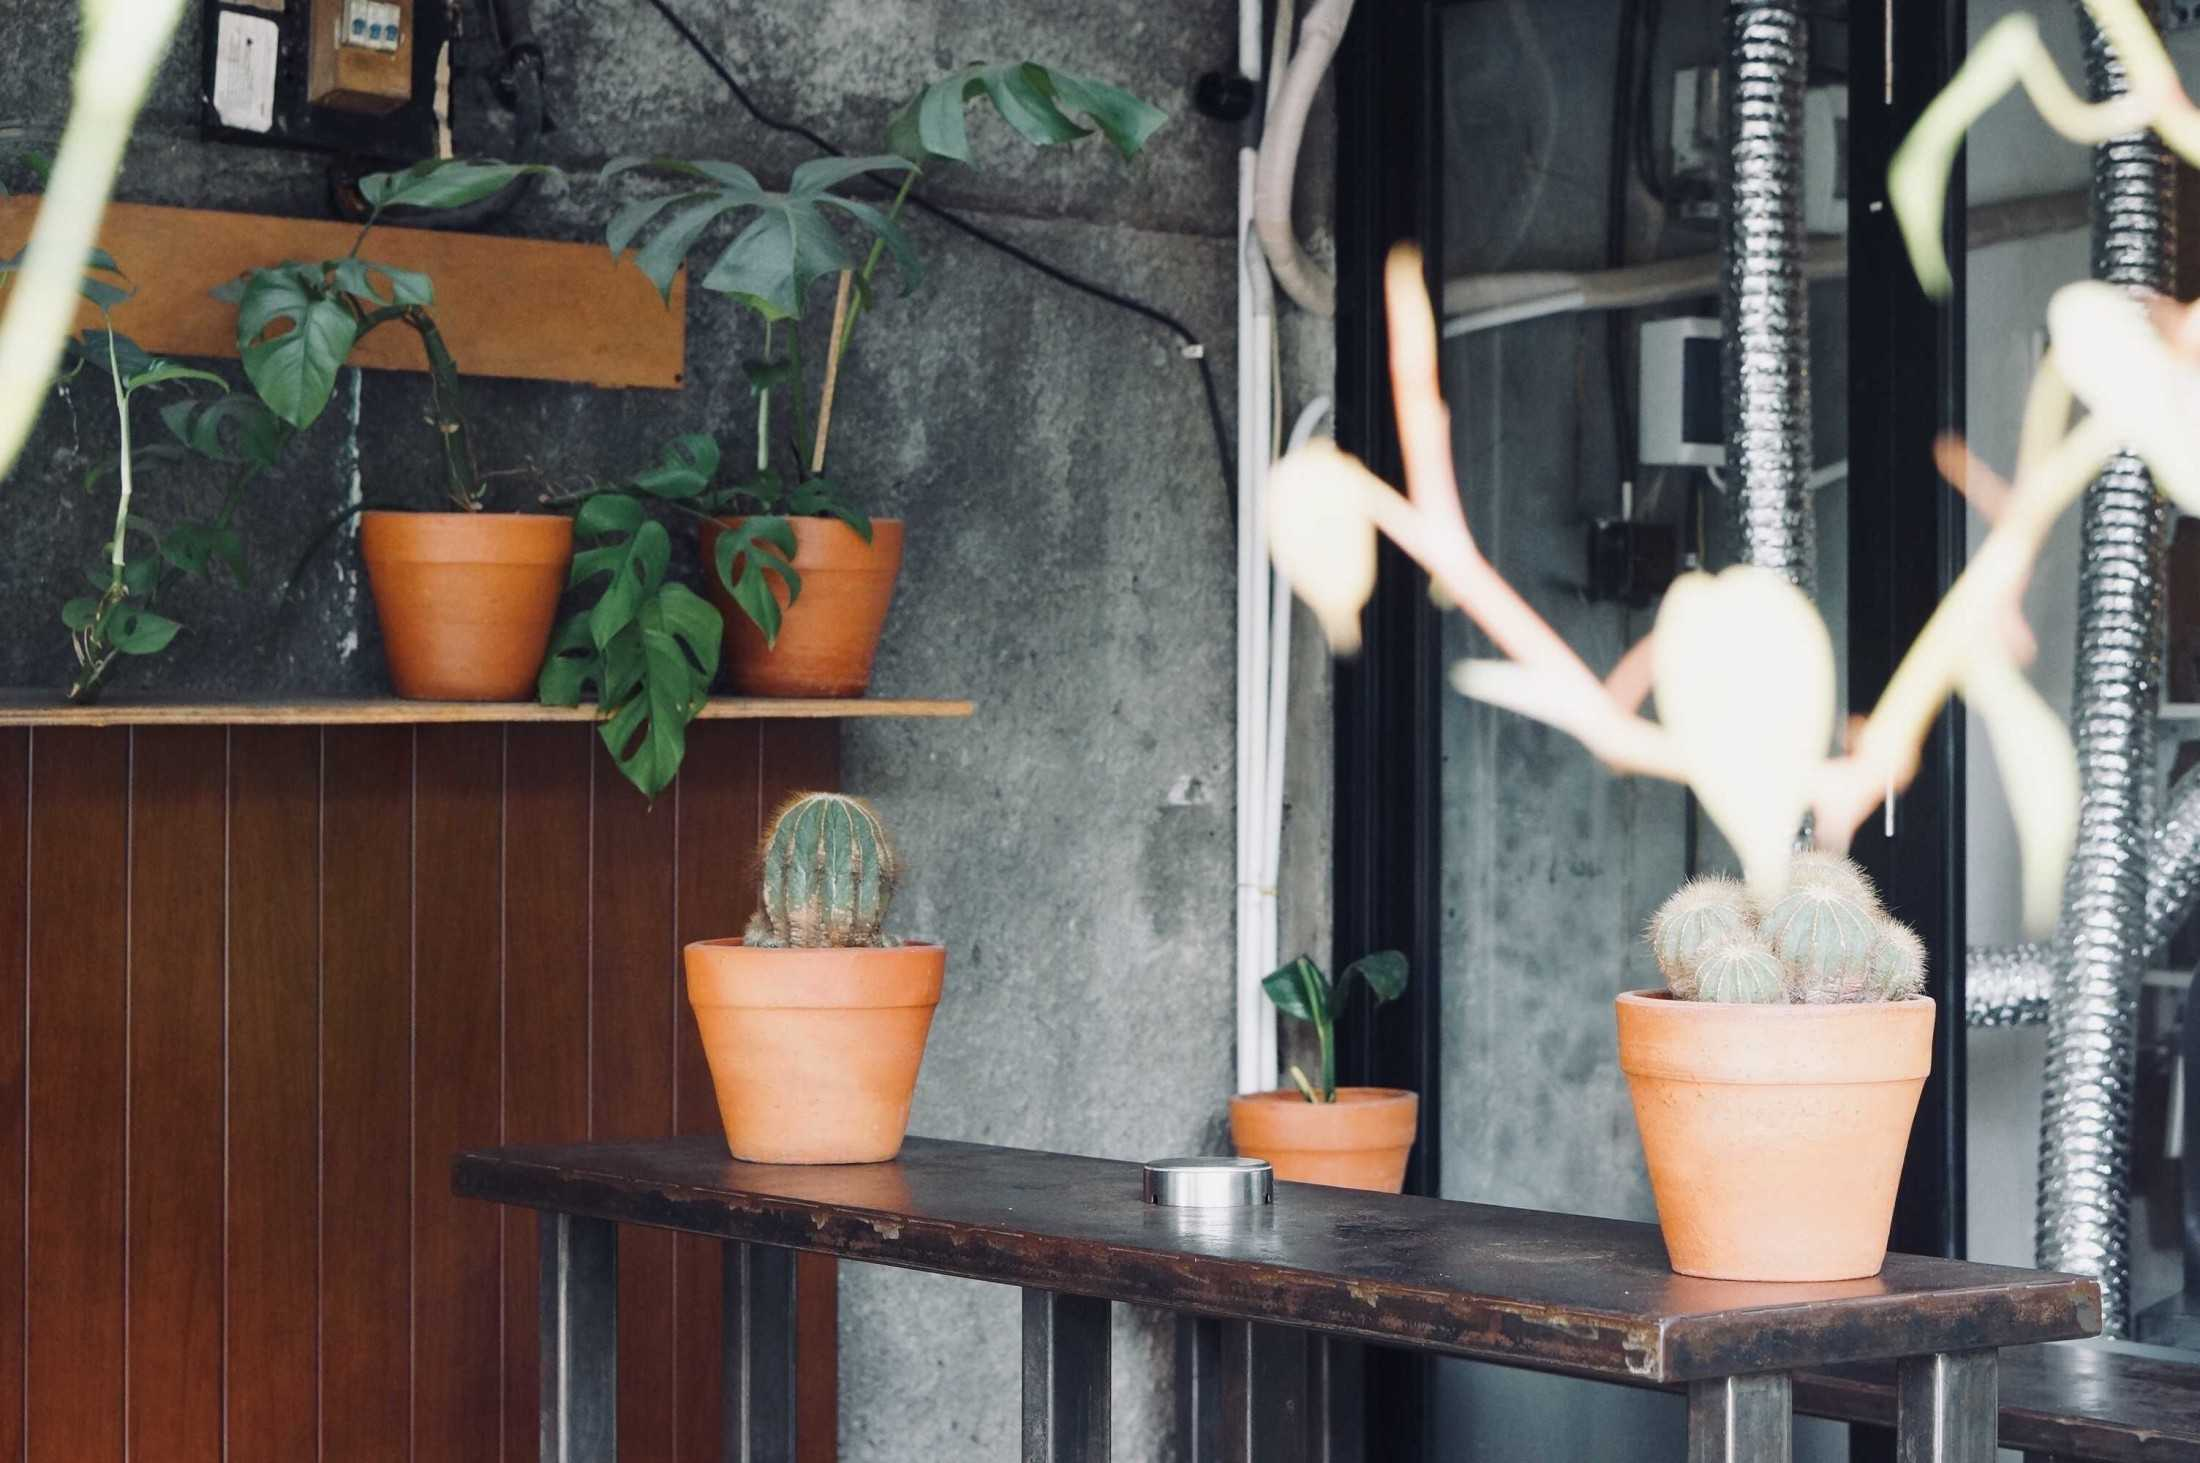 Ago Architects Kopi Sana  Jl. Panglima Polim V No.38, Rt.1/rw.7, Melawai, Kby. Baru, Jakarta, Daerah Khusus Ibukota Jakarta 12160, Indonesia Jl. Panglima Polim V No.38, Rt.1/rw.7, Melawai, Kby. Baru, Jakarta, Daerah Khusus Ibukota Jakarta 12160, Indonesia Ago-Architects-Kopi-Sana-  59801